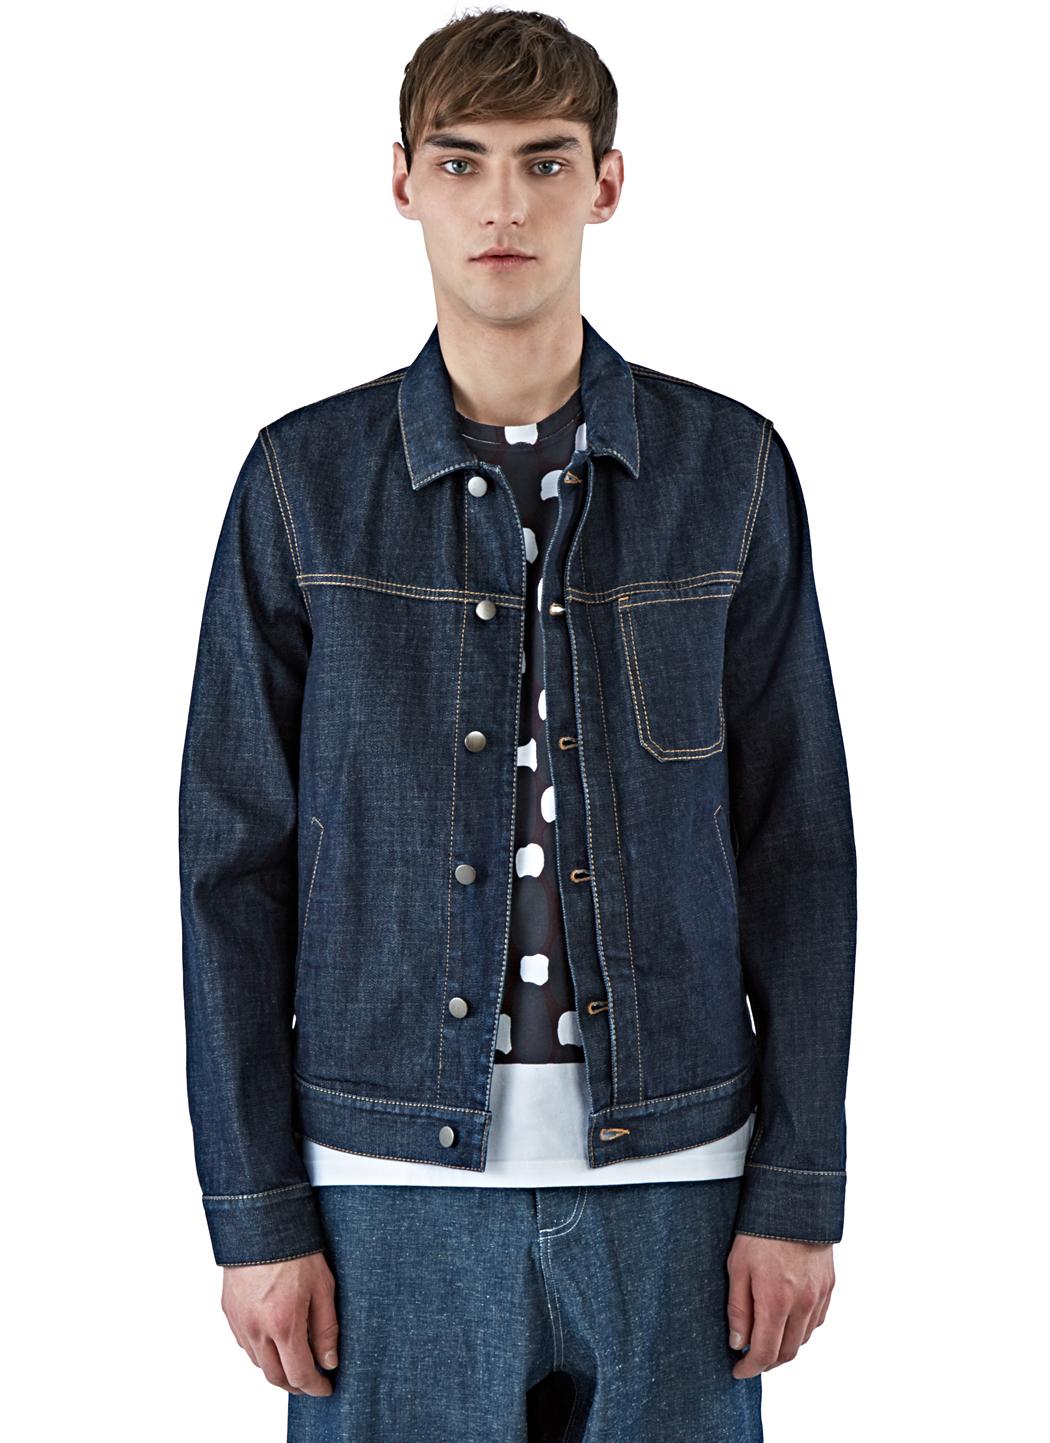 Marni Men's Raw Denim Jacket In Indigo in Blue for Men | Lyst